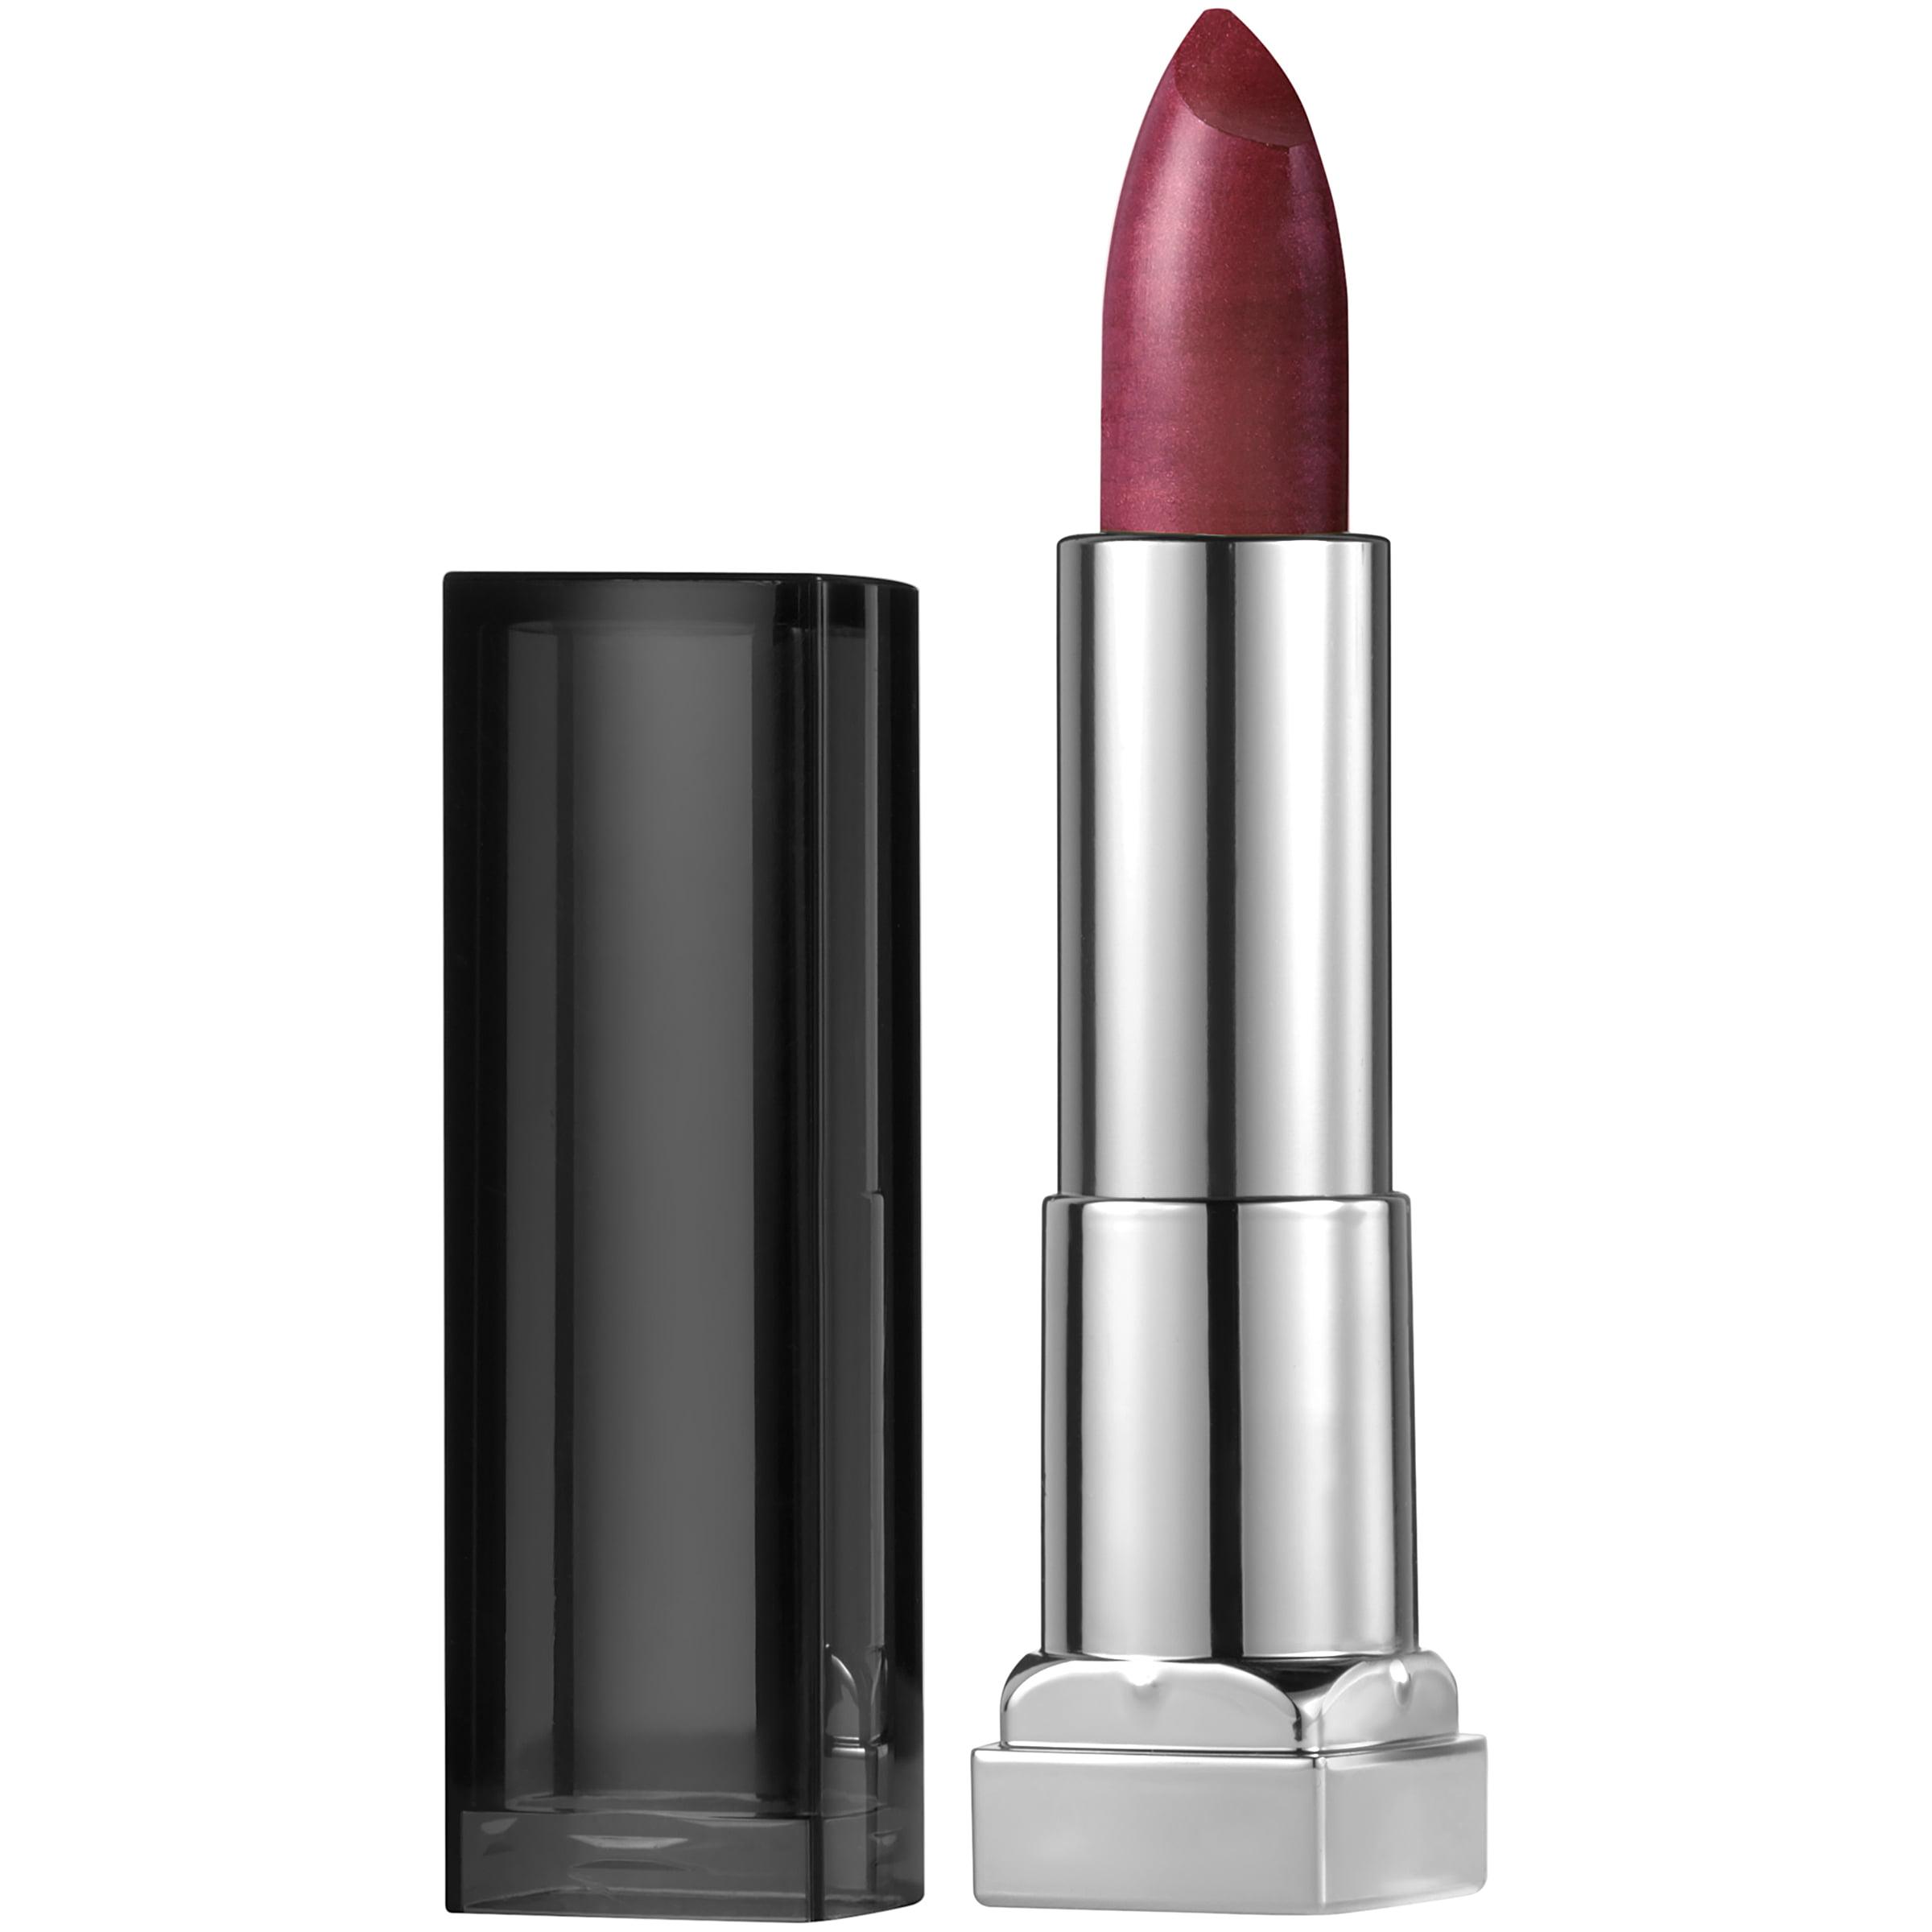 Maybelline New York Color Sensational Matte Metallics Lipstick